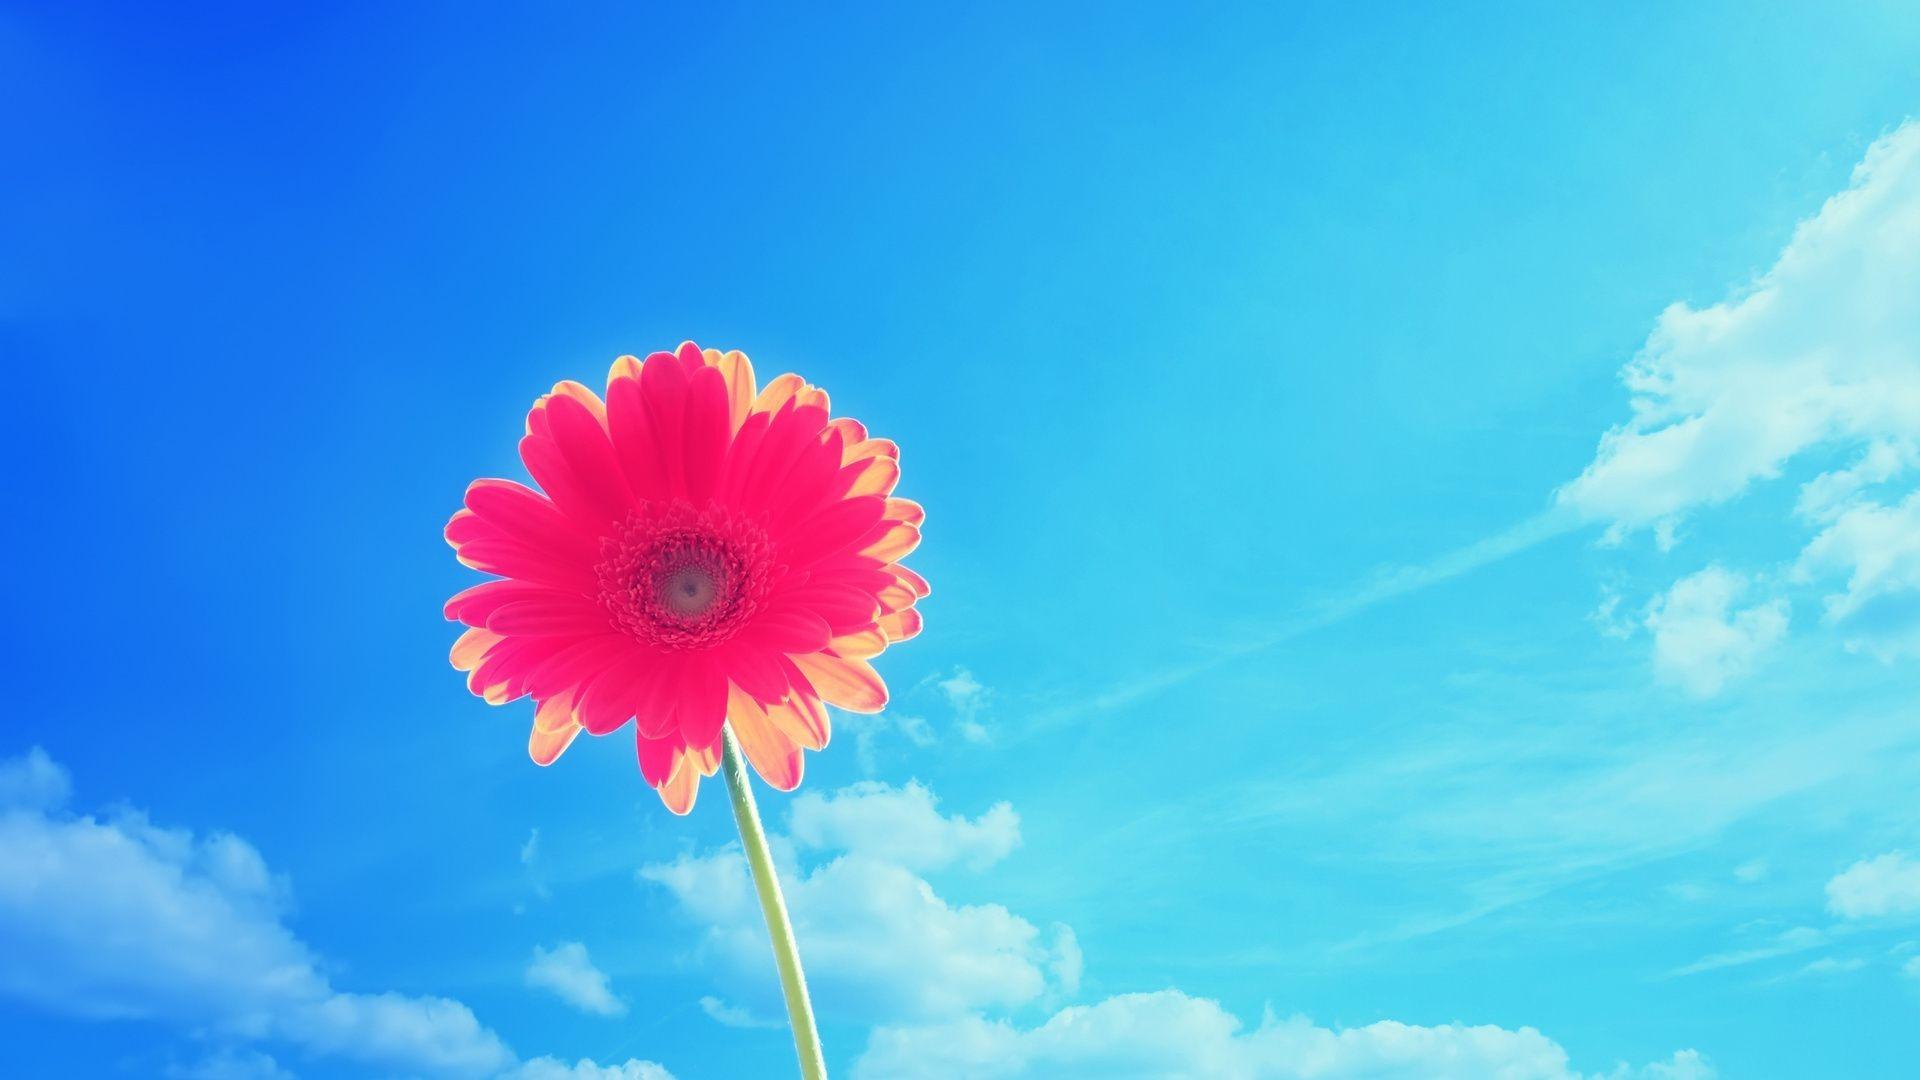 Анимации, картинки цветы на фоне неба